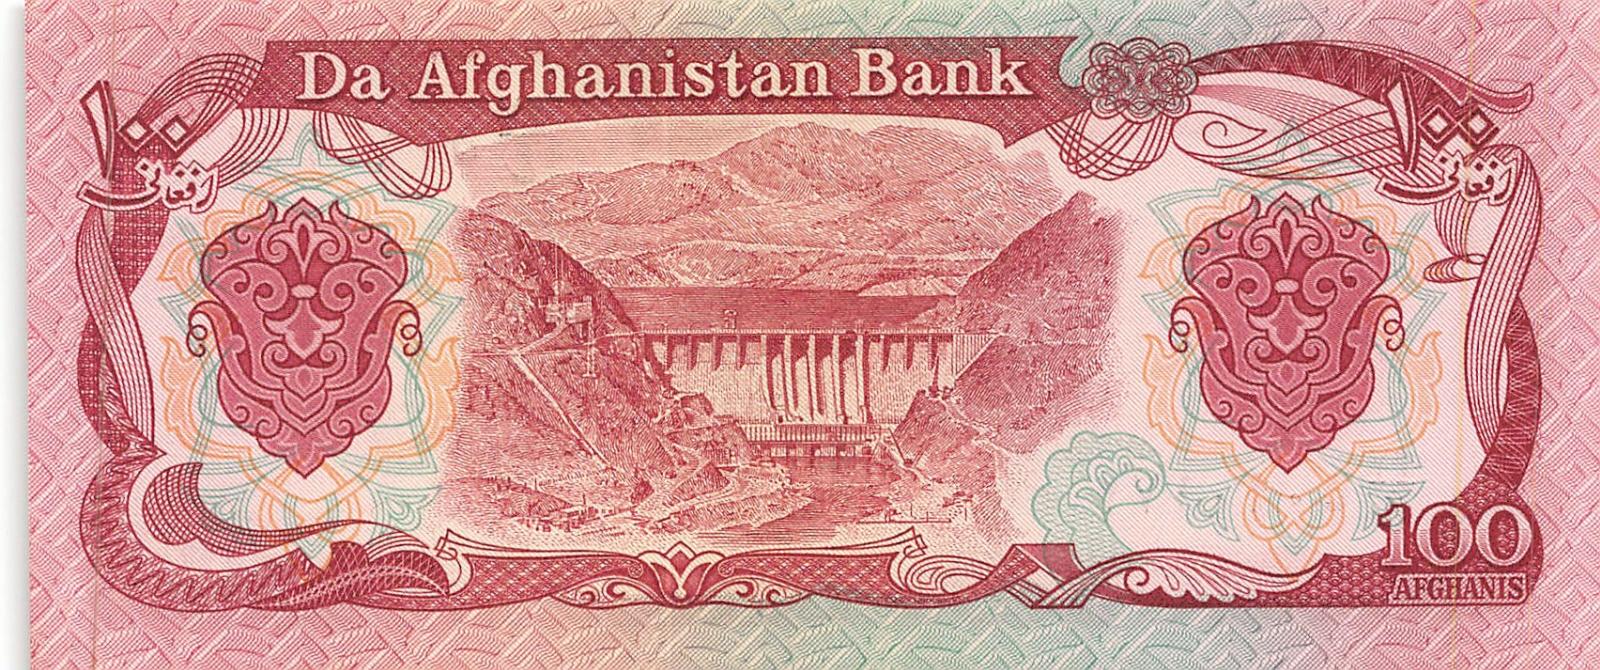 60B (1977)